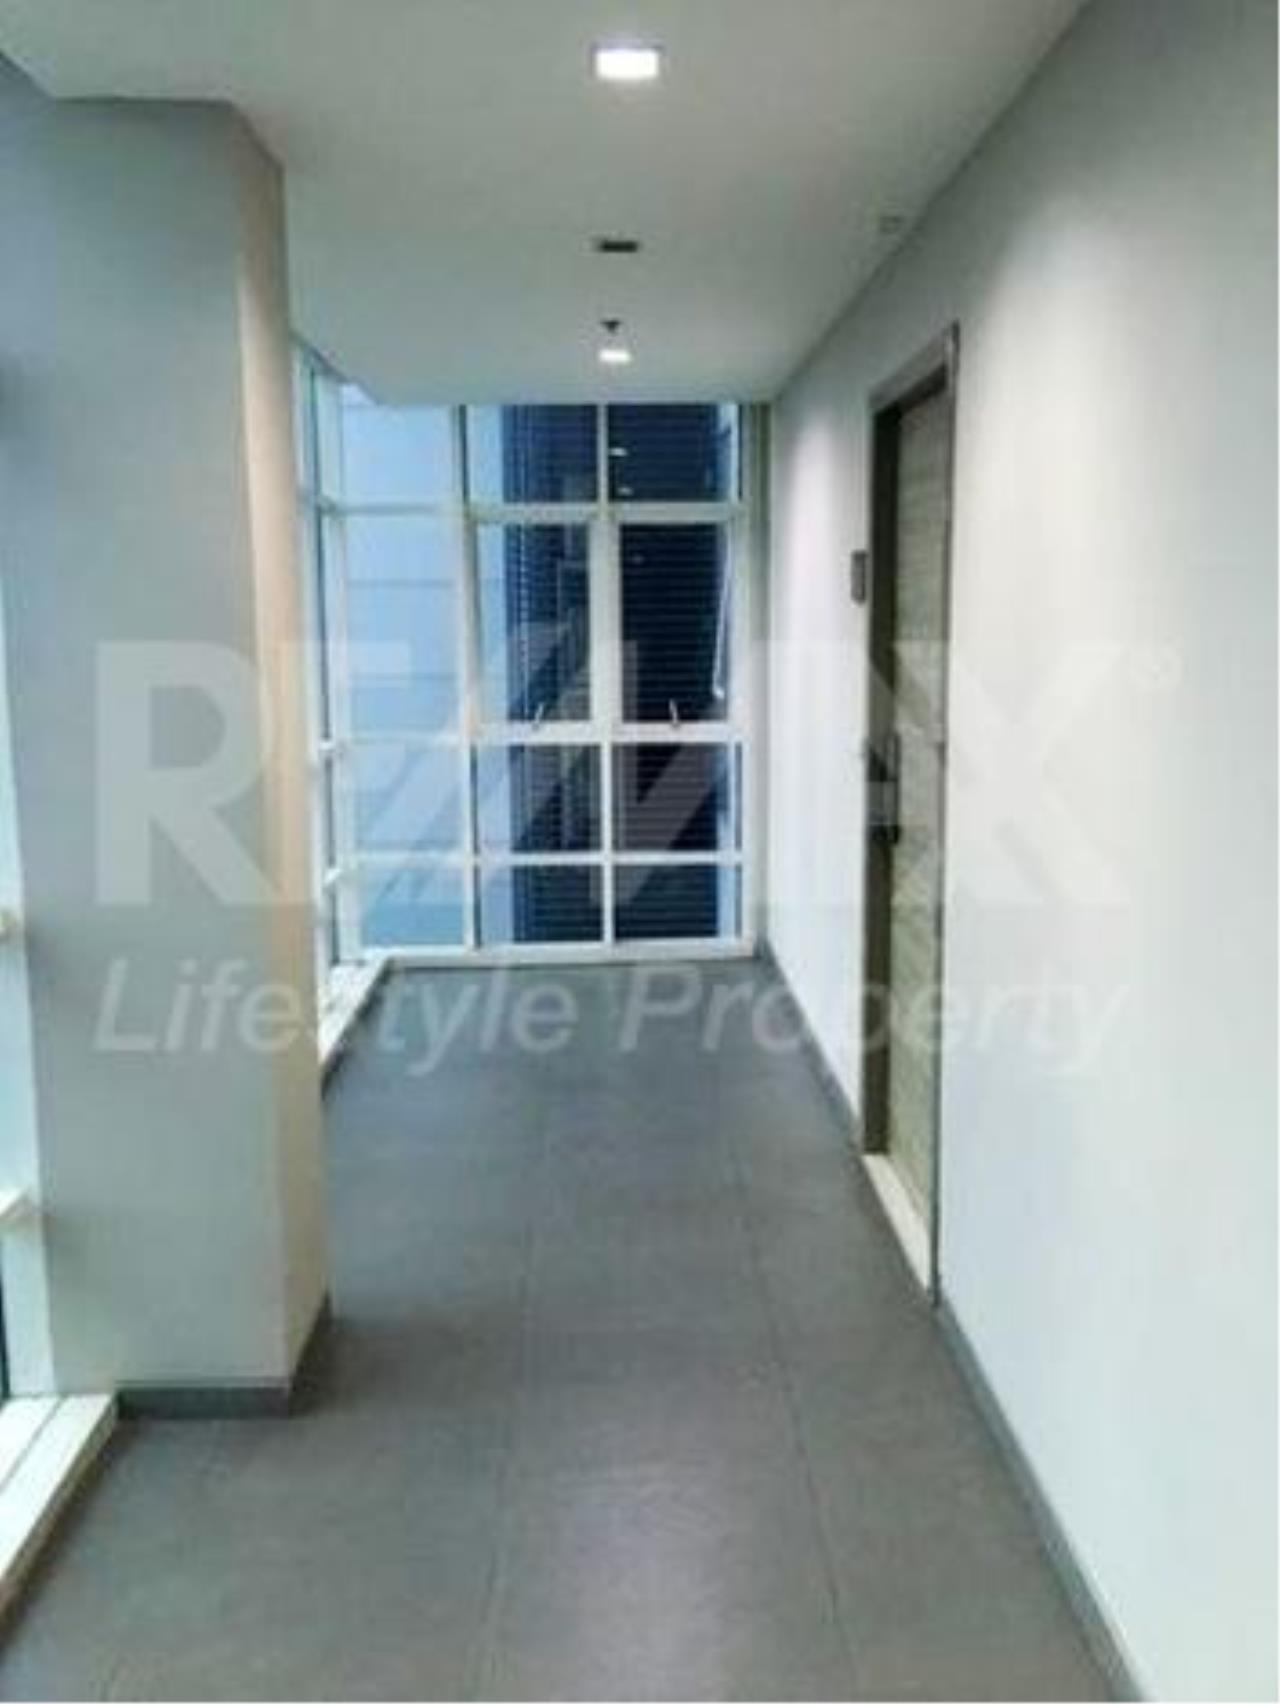 RE/MAX LifeStyle Property Agency's Ideo Verve Ratchaprarop 6